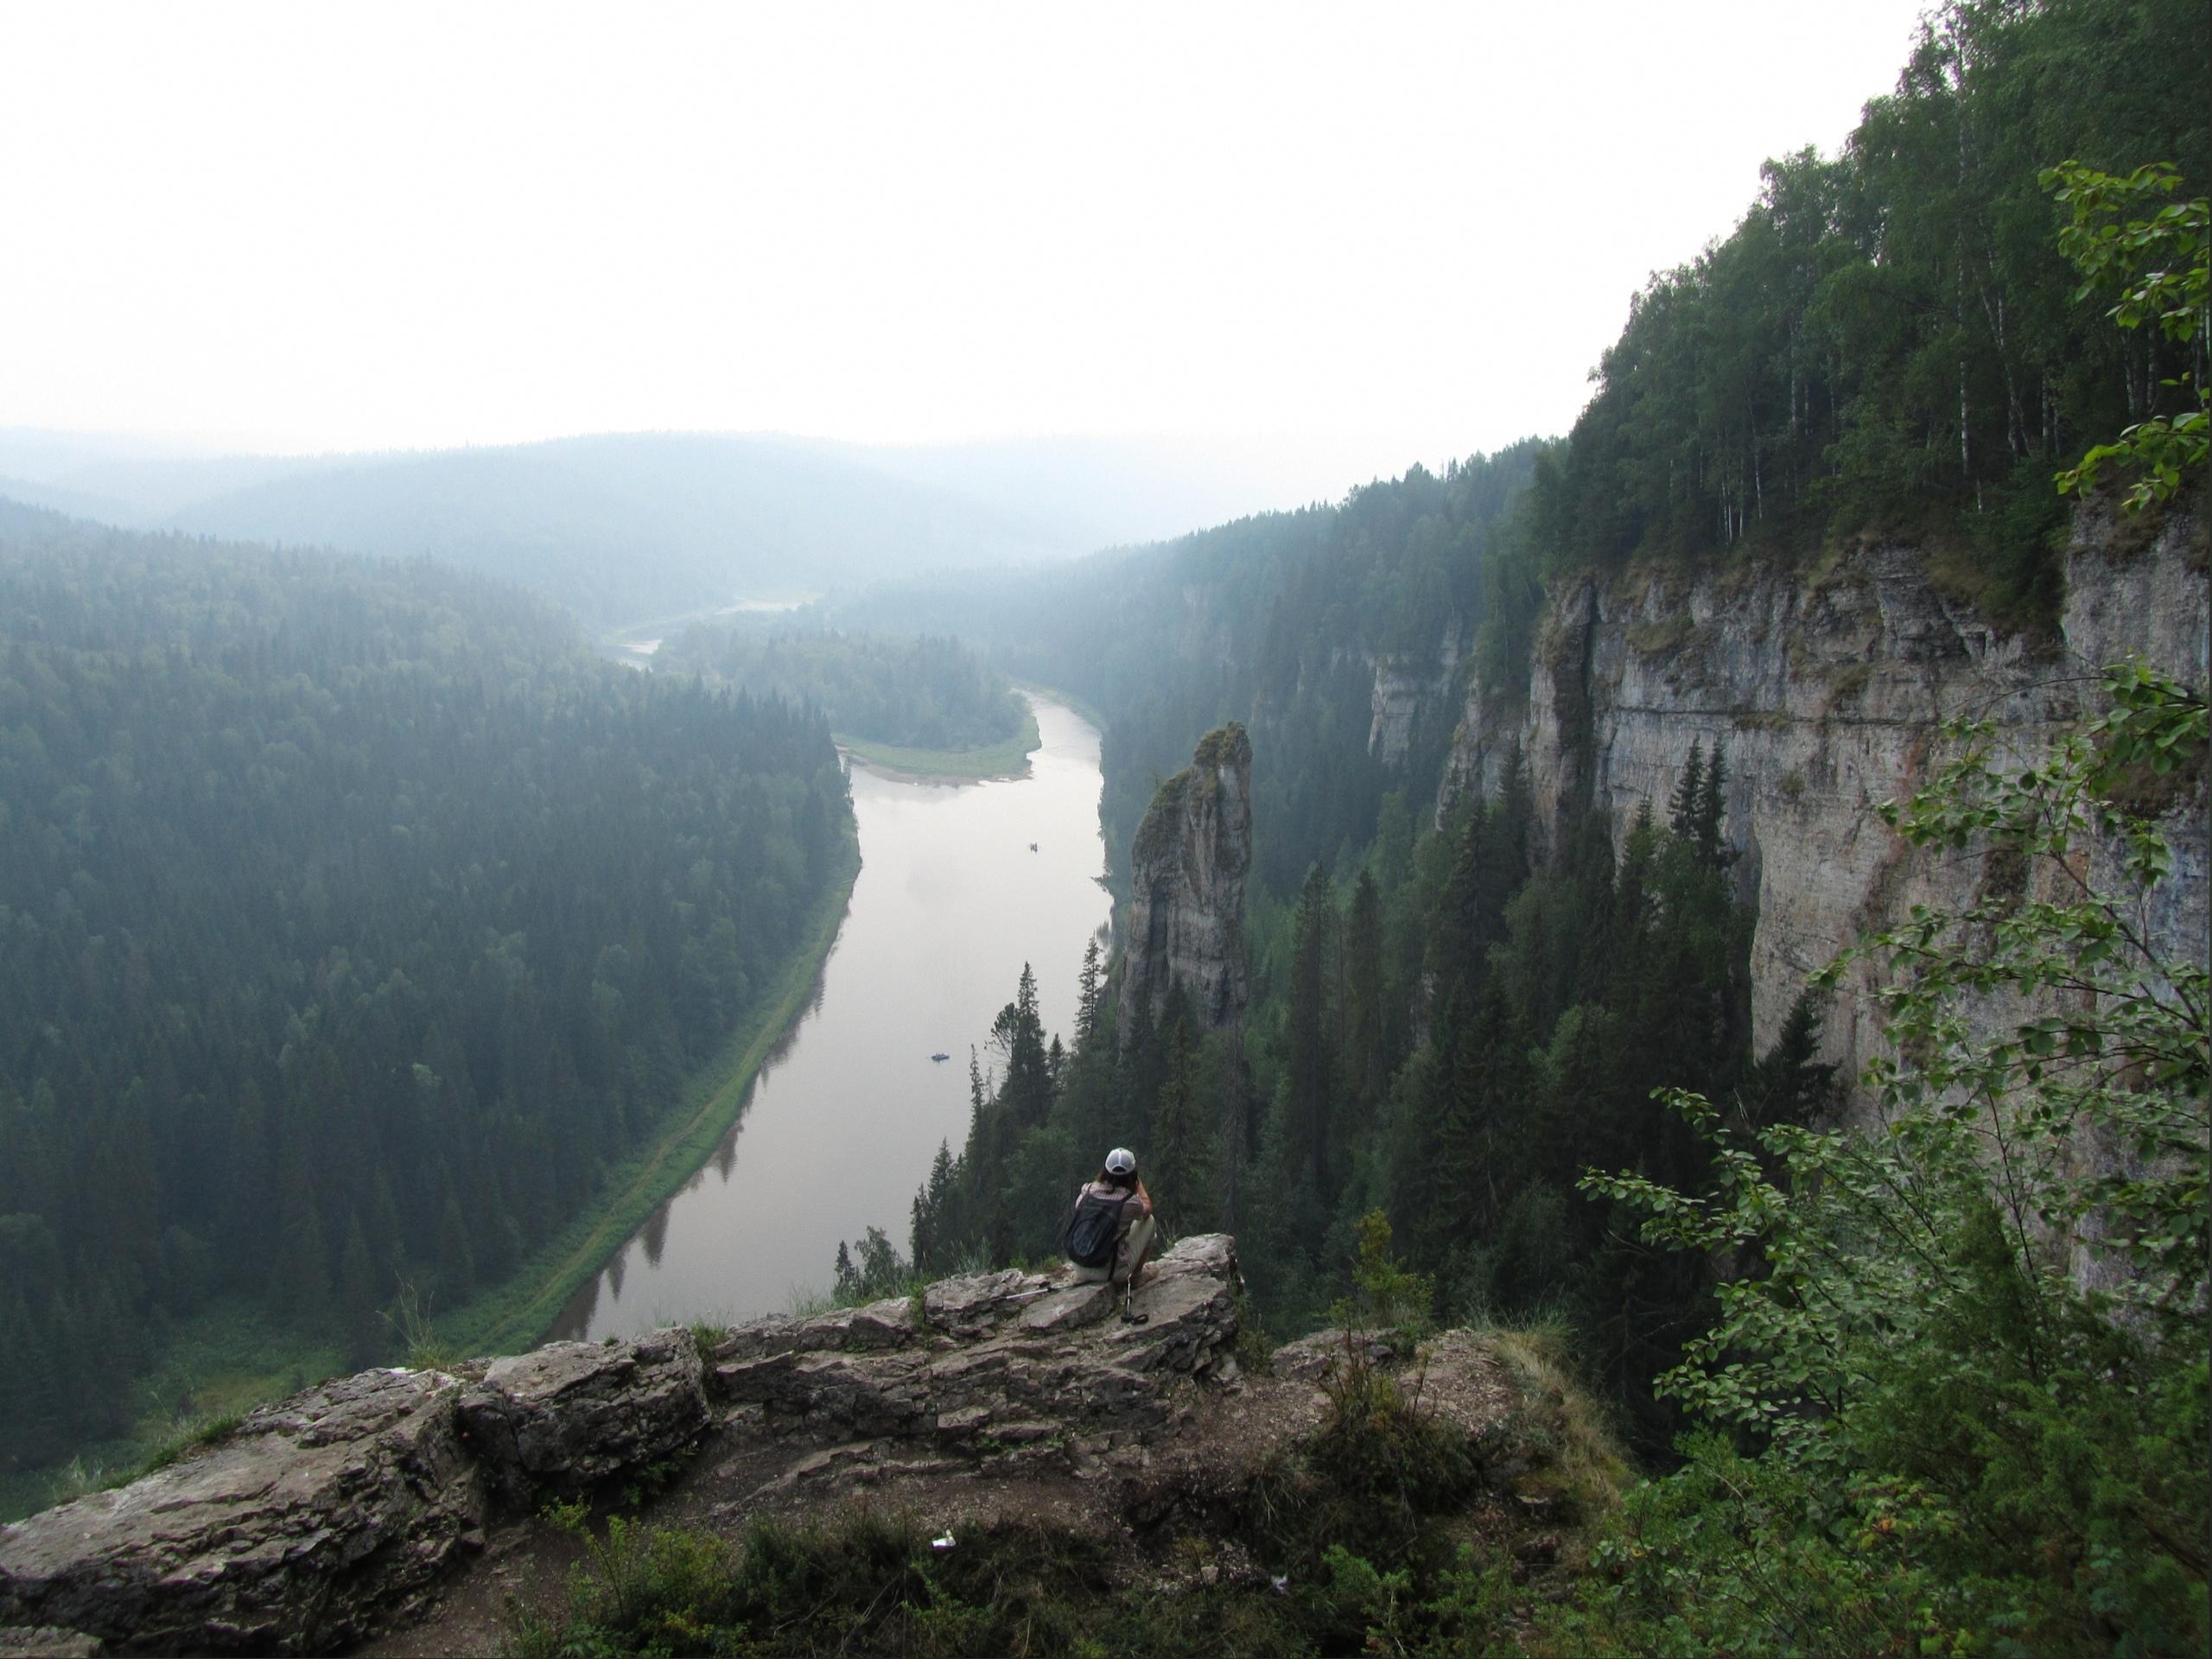 Река Усьва и Усьвинские столбы